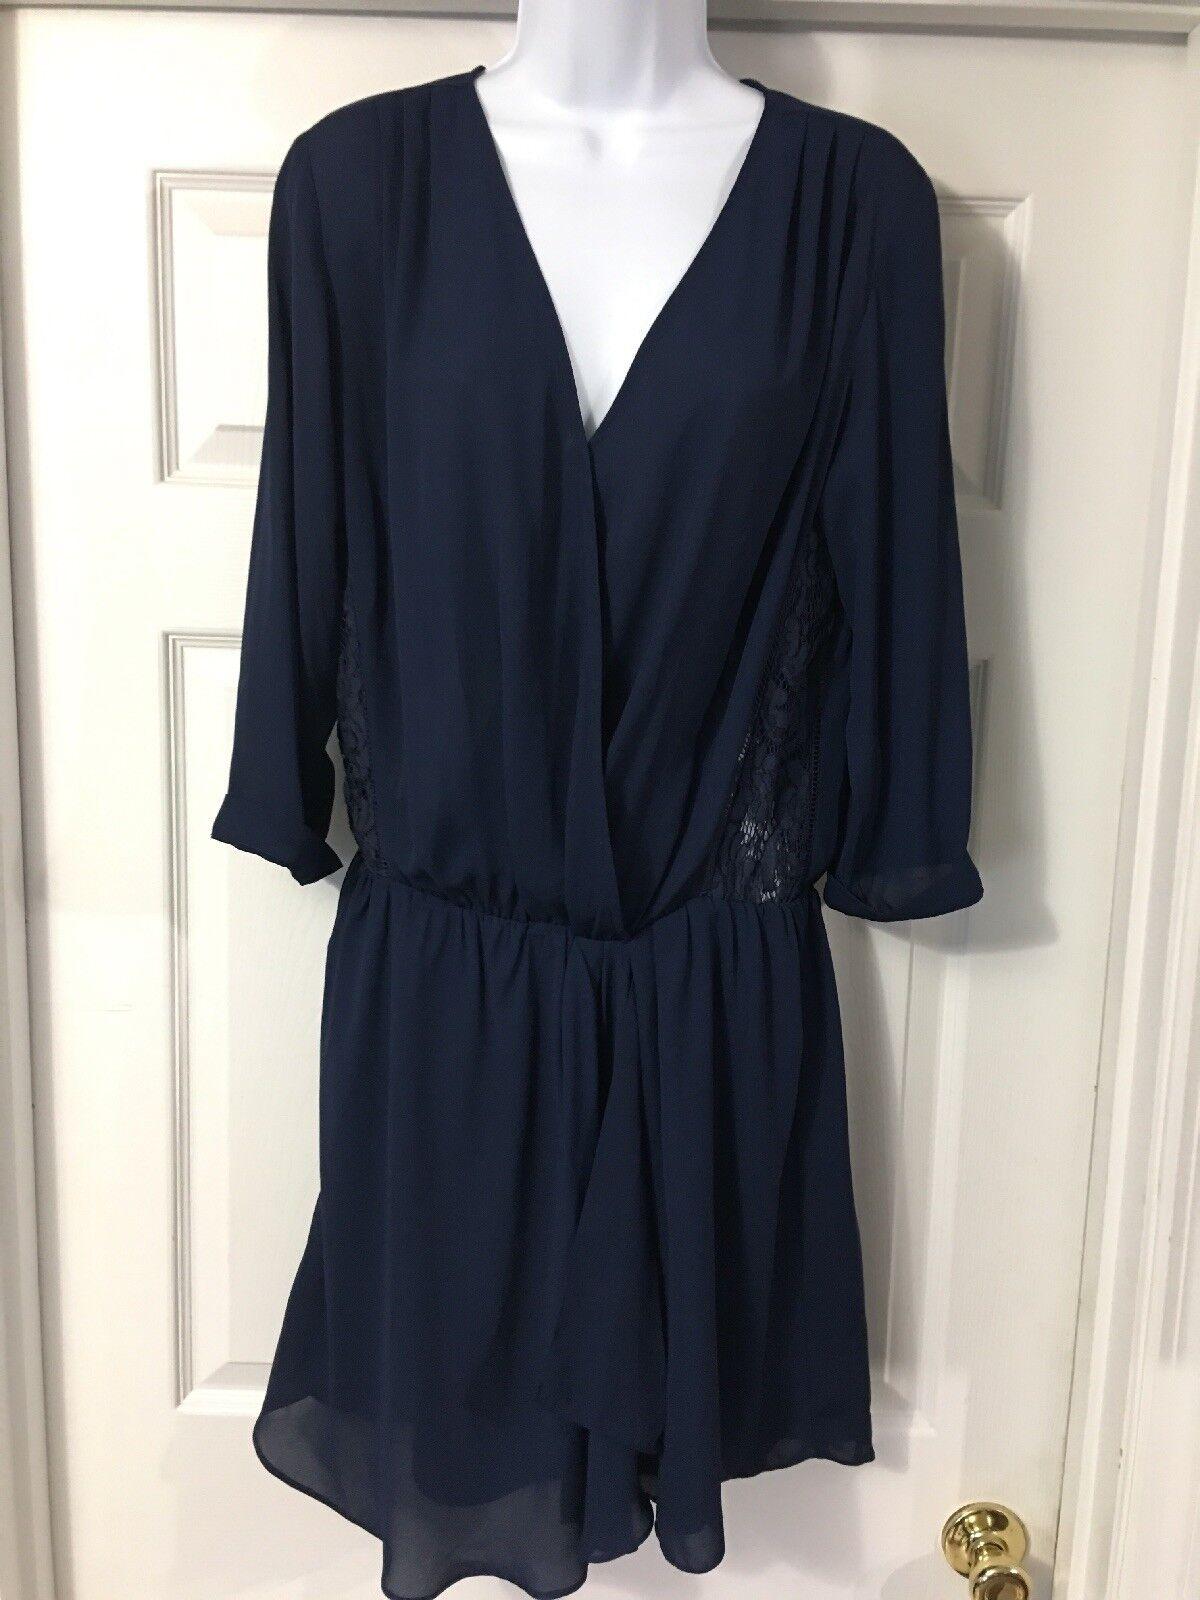 NWT Heartloom Dress - Dark bluee - Laville - Free Shipping